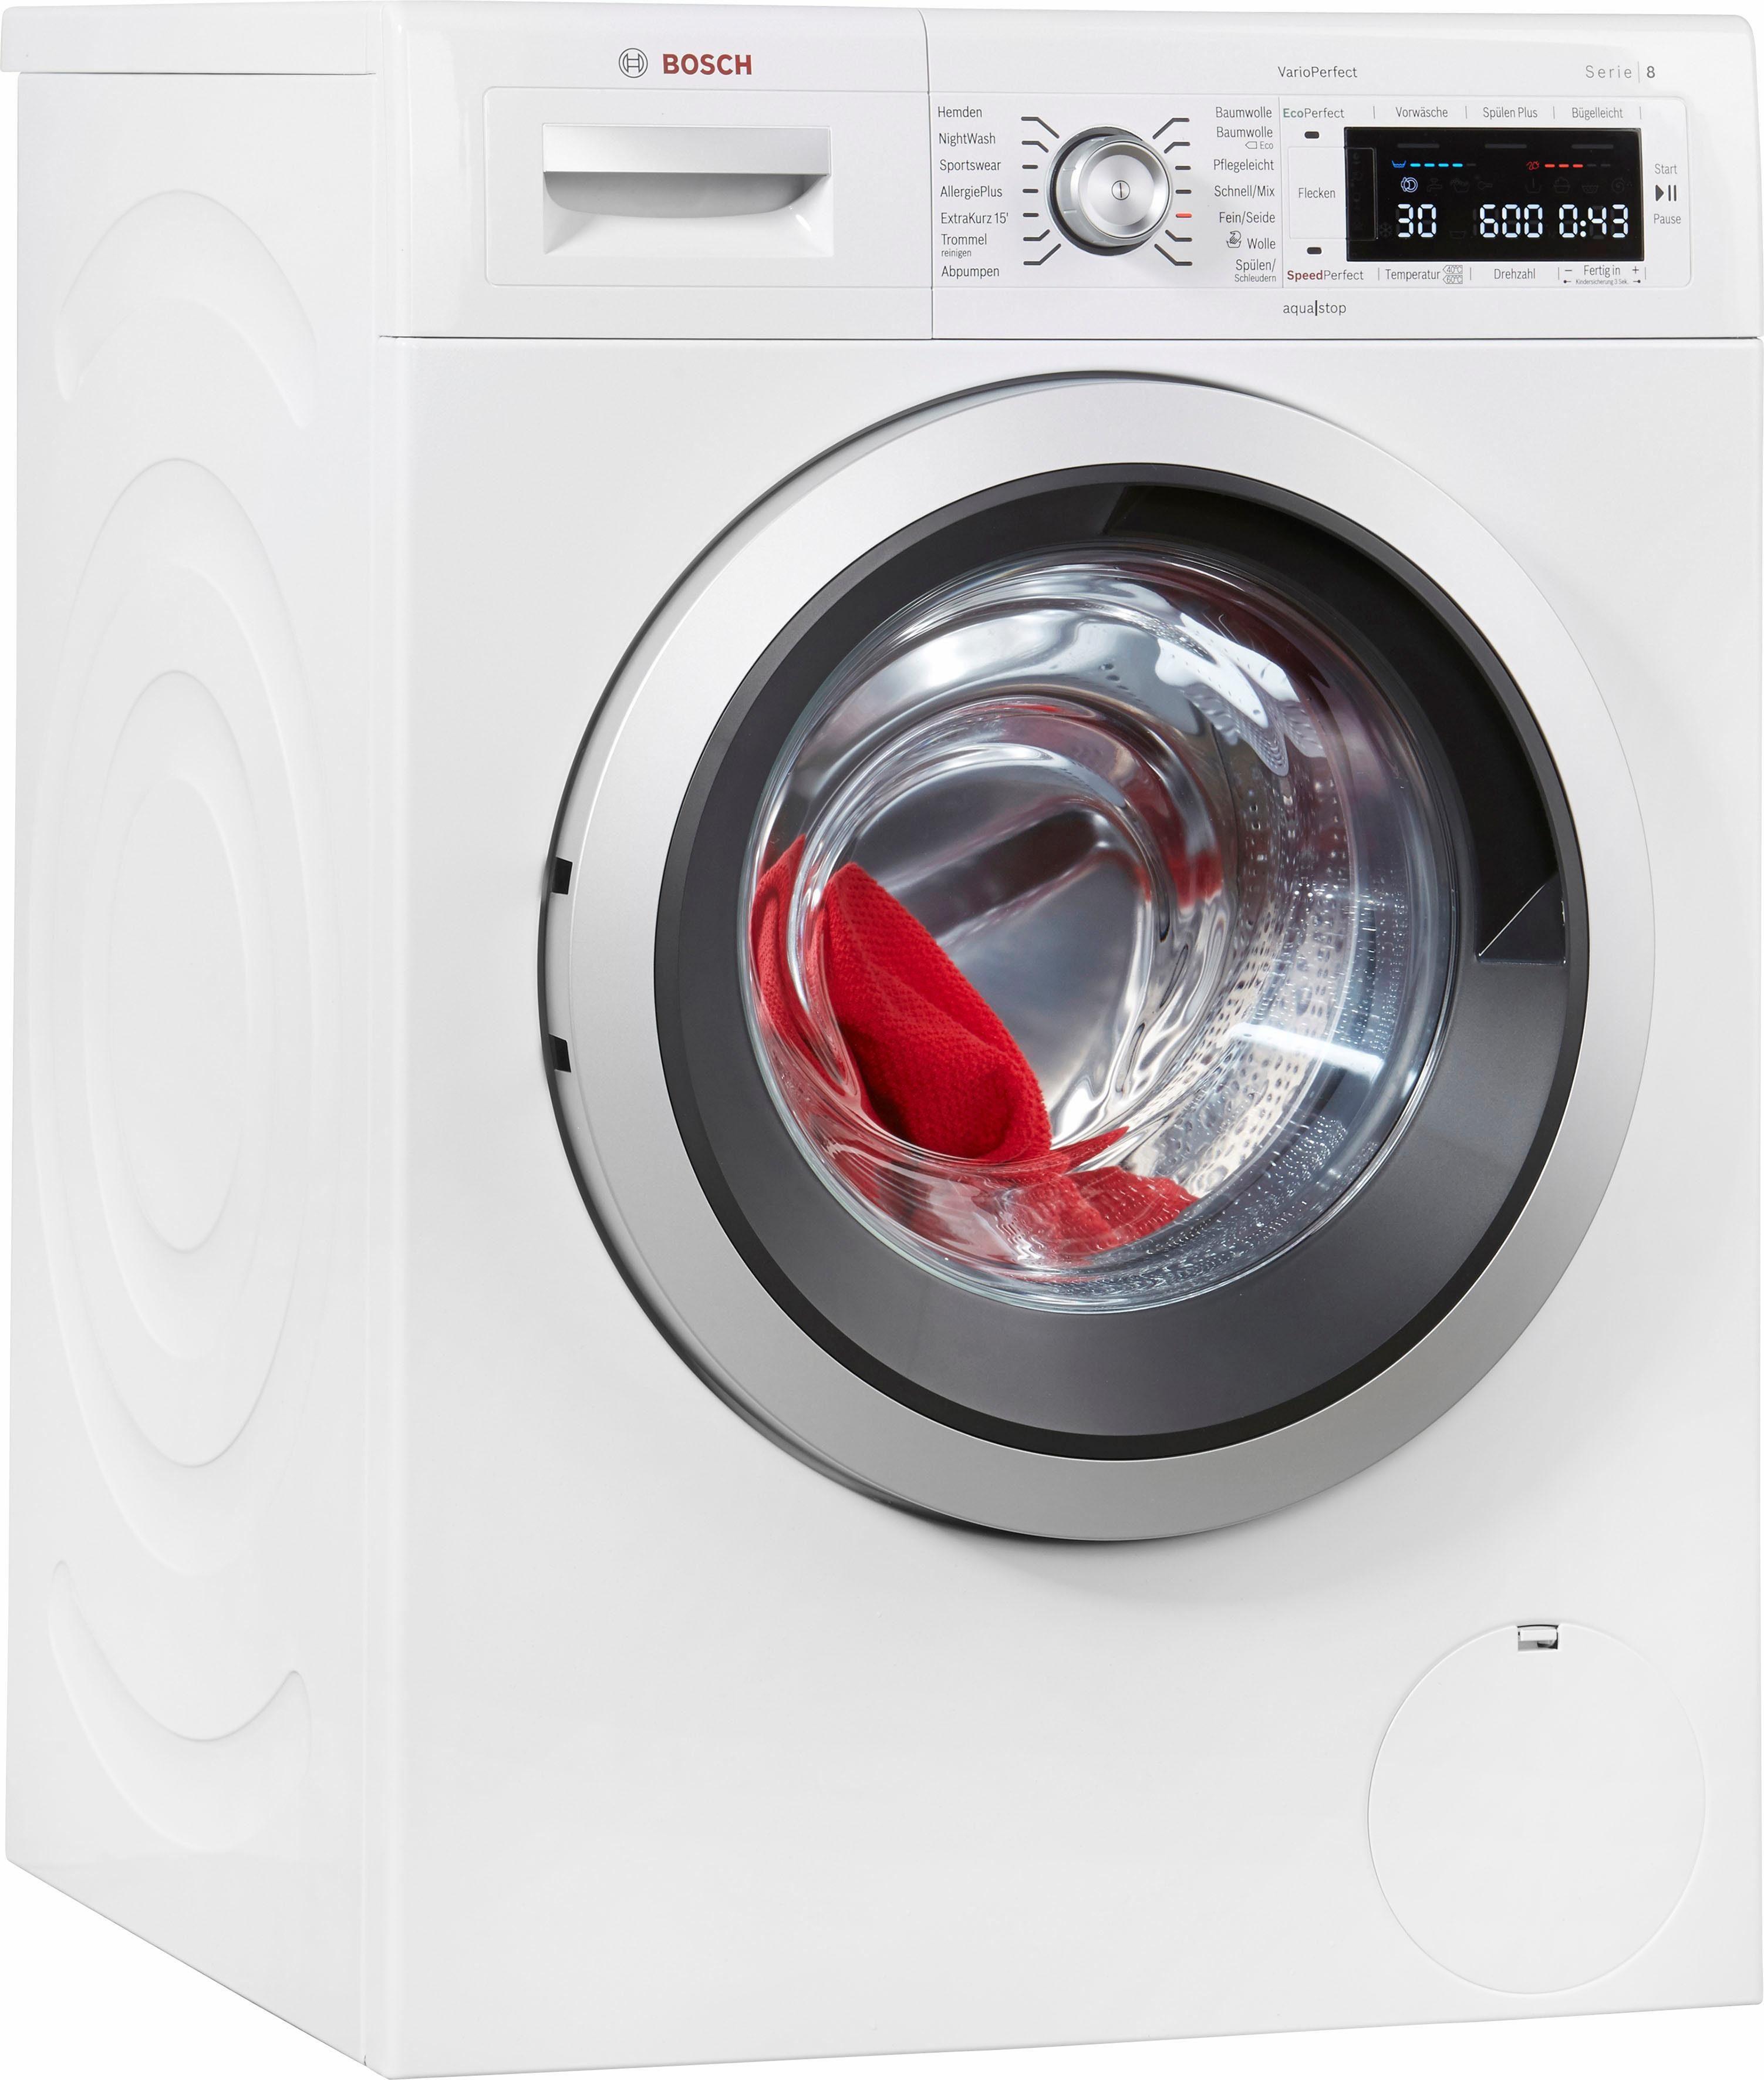 BOSCH Waschmaschine Serie 8 WAW32541, A+++, 8 kg, 1600 U/Min